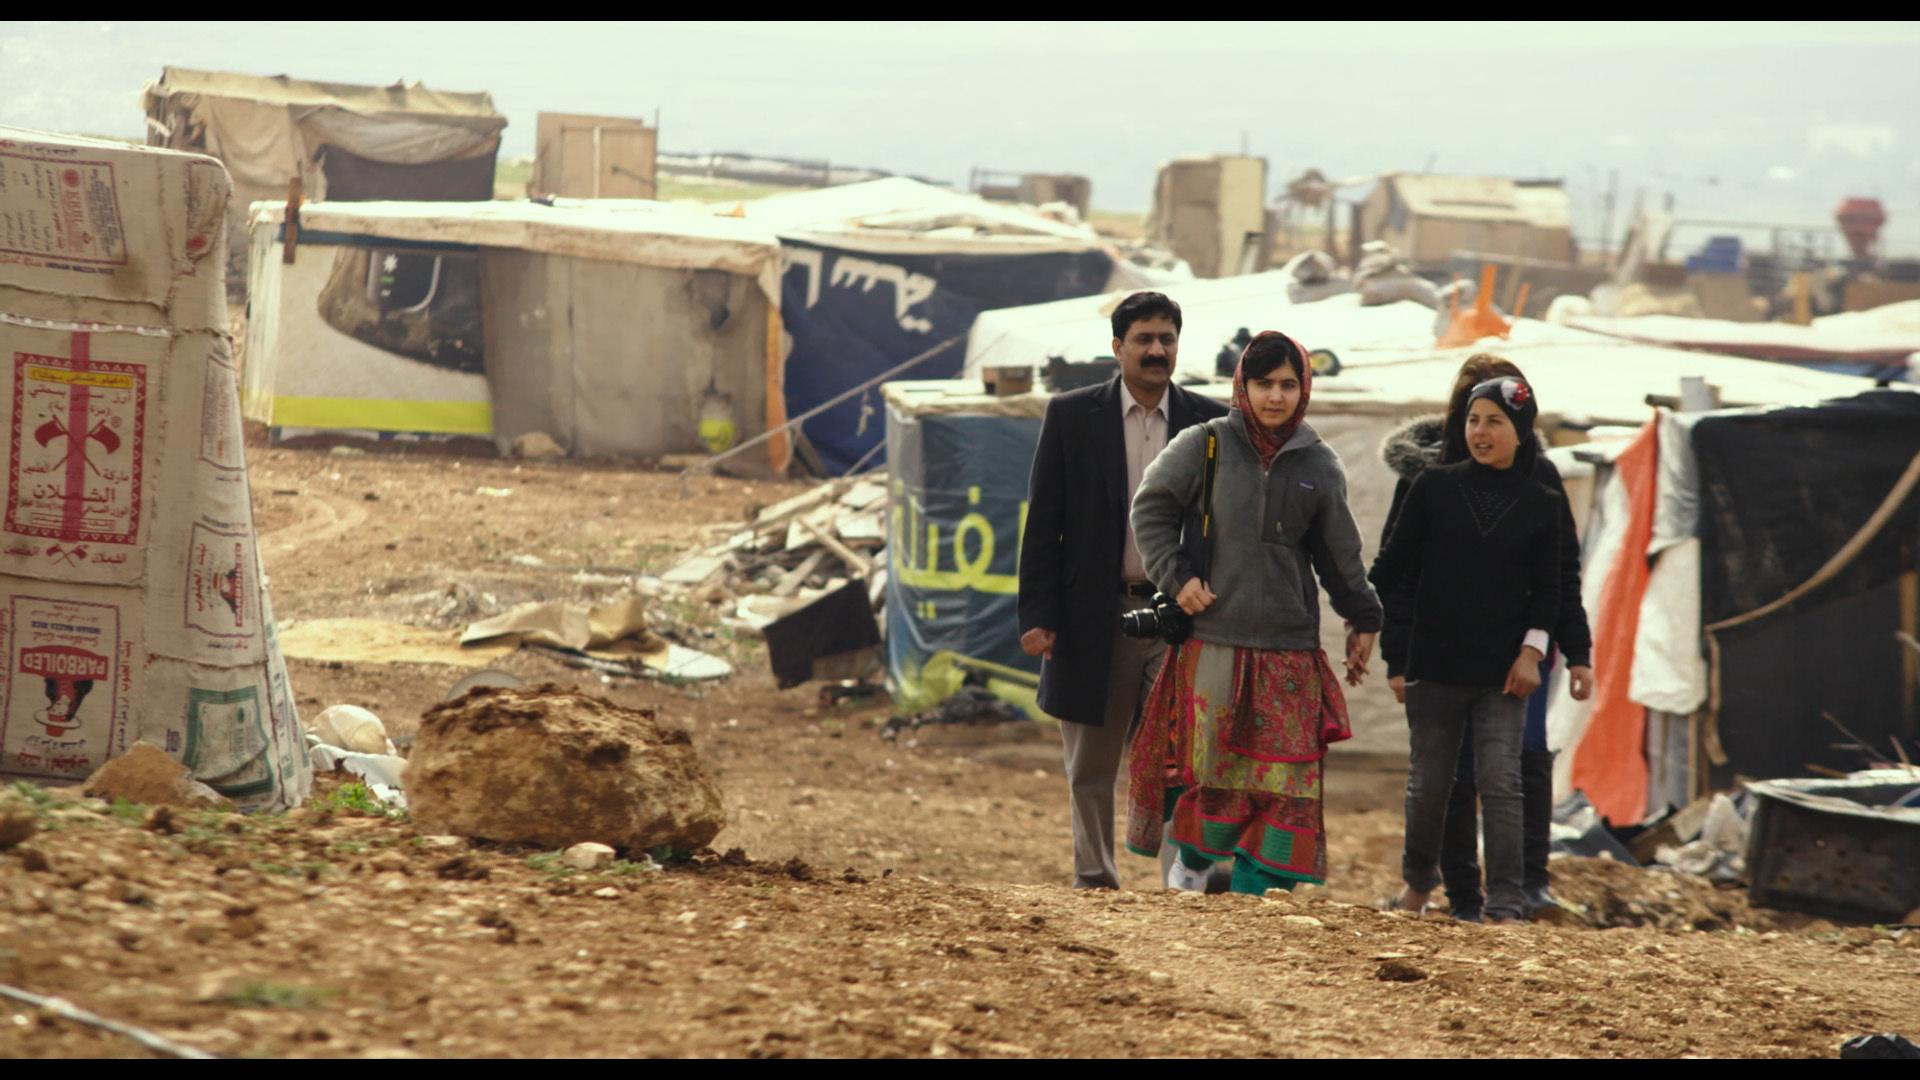 Zia Yousafzai and Malala Yousafzai and Syrian refugee Rimah in Syrian Refugee Tent Camp in Jordan.